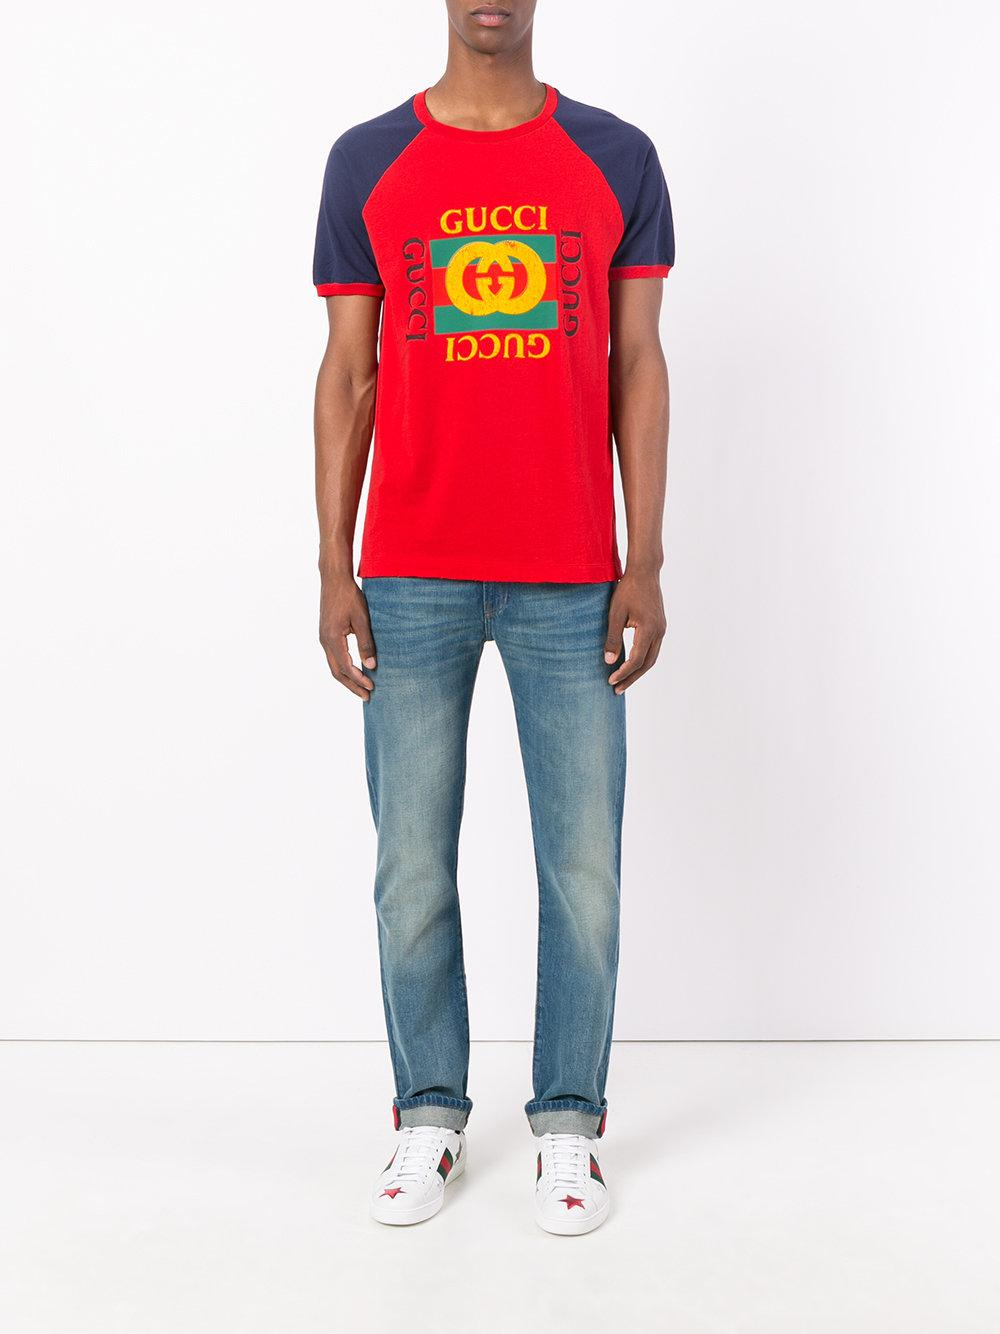 lyst gucci print t shirt in red for men. Black Bedroom Furniture Sets. Home Design Ideas